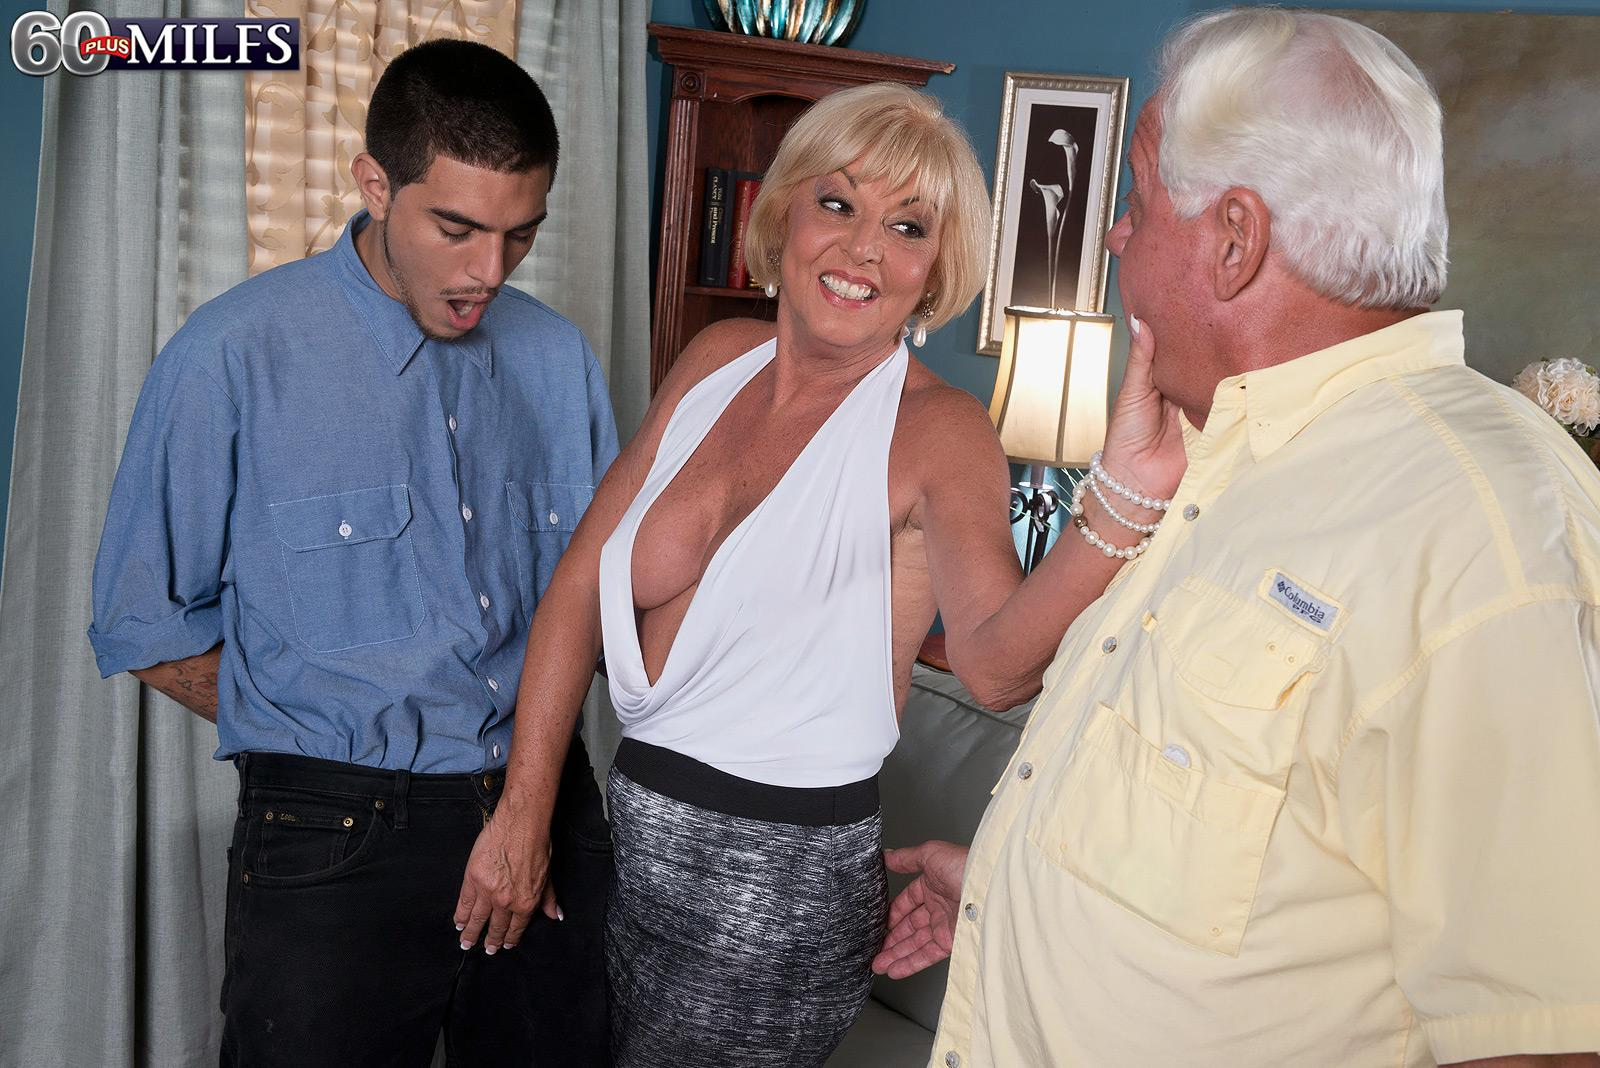 Platinum blonde granny scarlet andrews releasing gigantic breasts before cuck husband